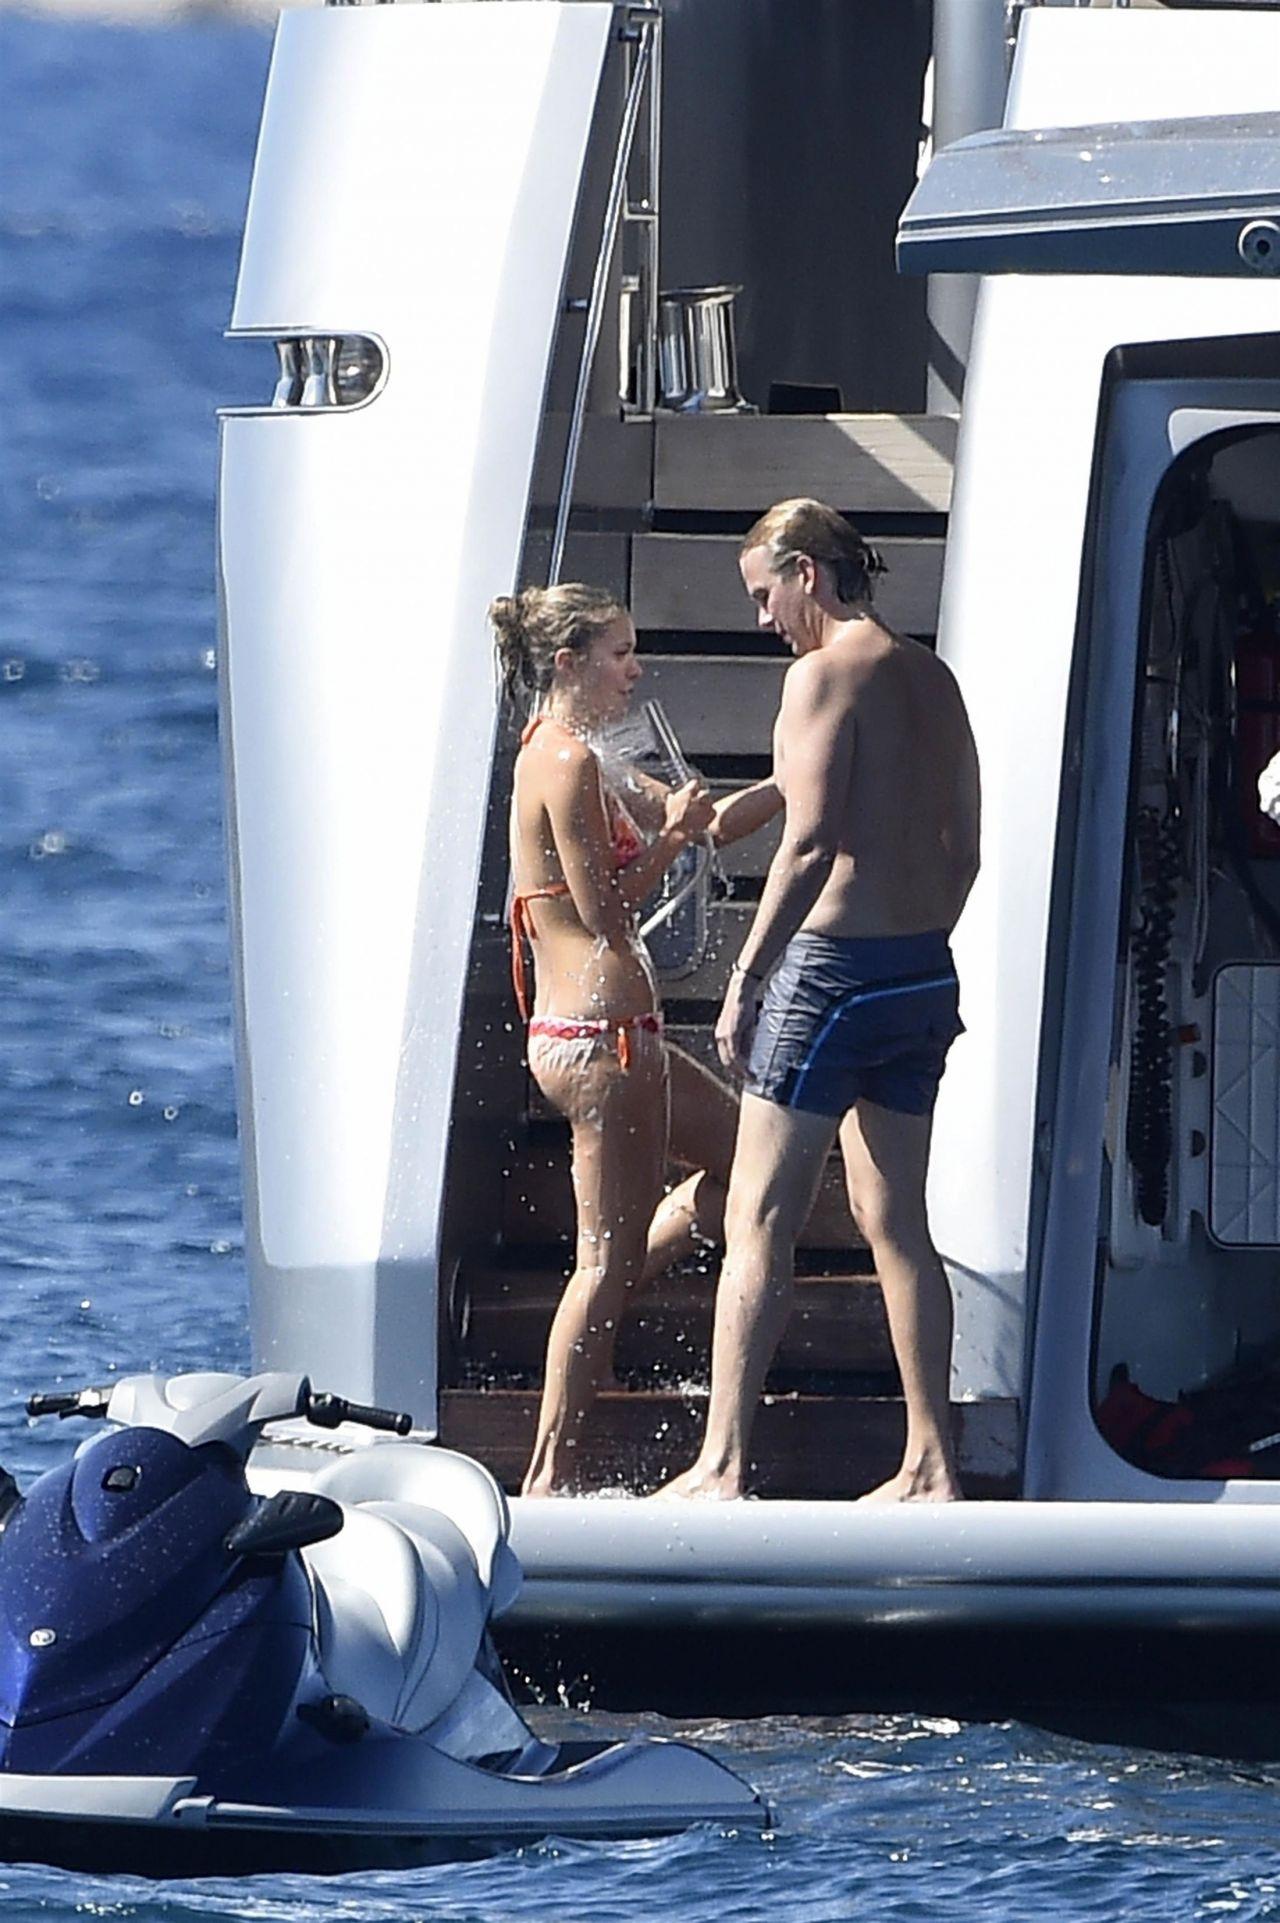 Barbara Meier And Victoria Swarovski On A Luxury Yacht In